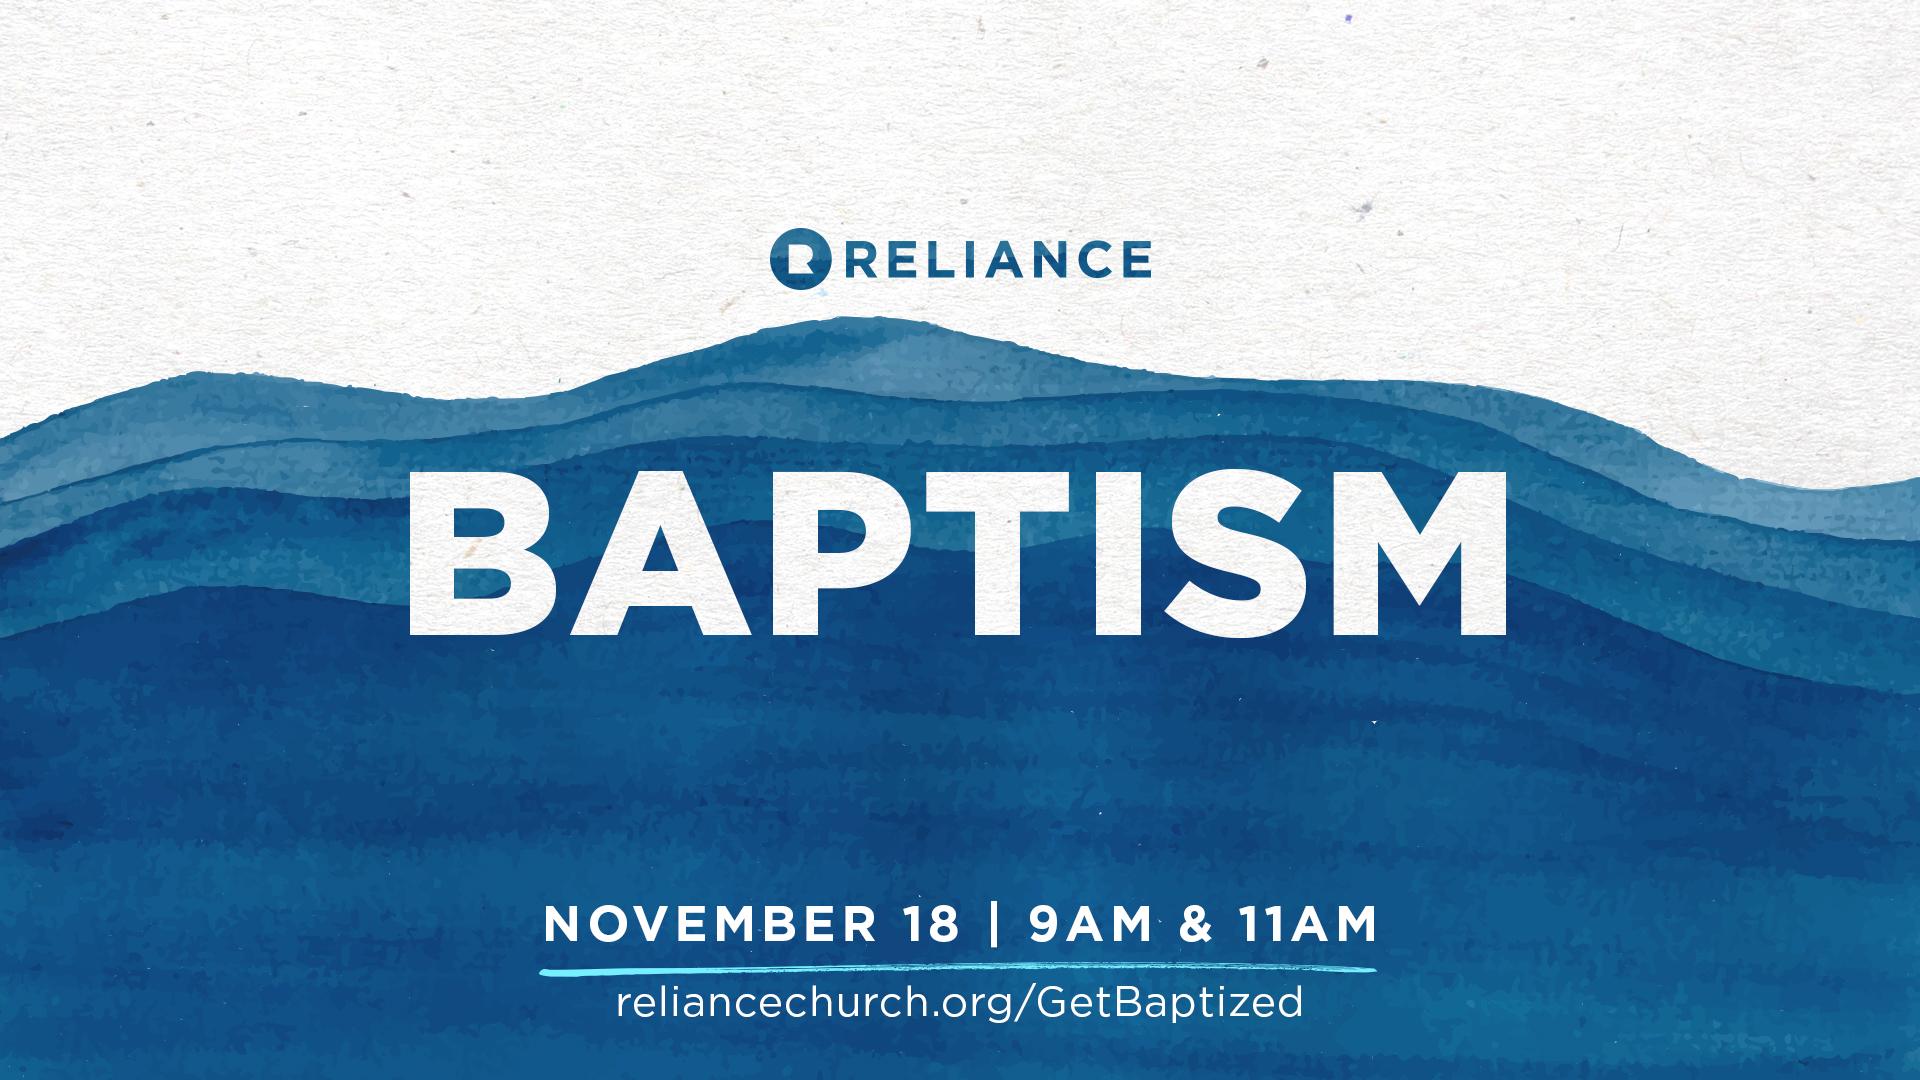 Reliance Baptism_Concept 1 (1)